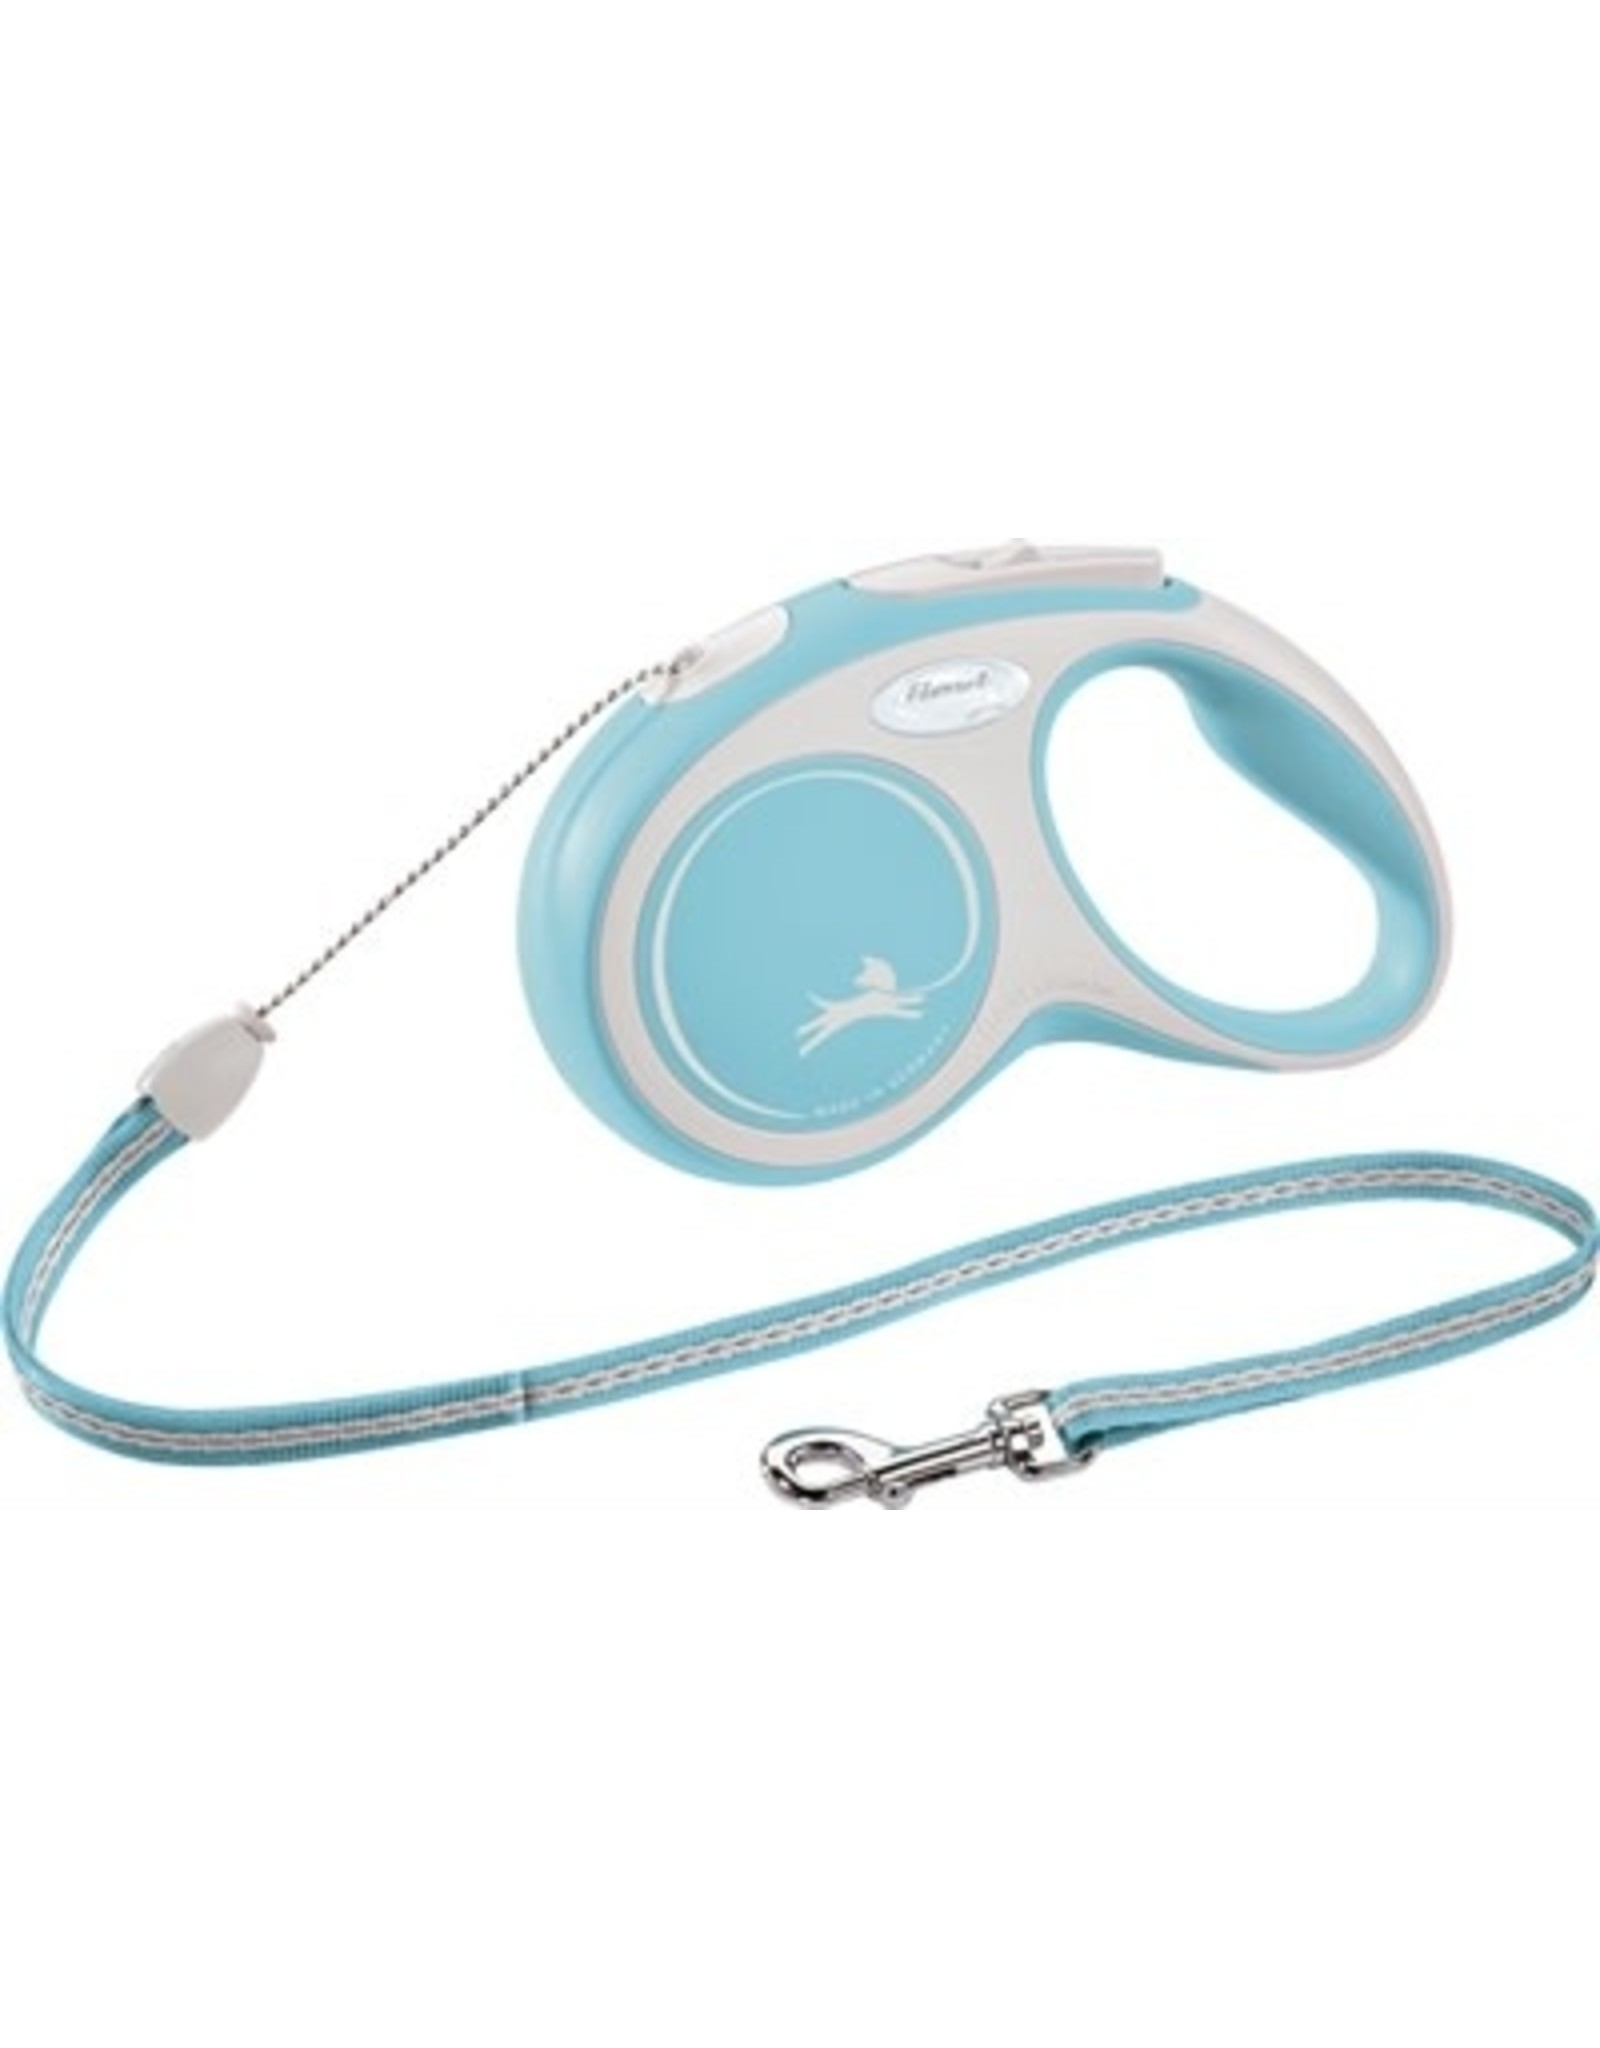 Flexi Comfort M 5 meter Blue